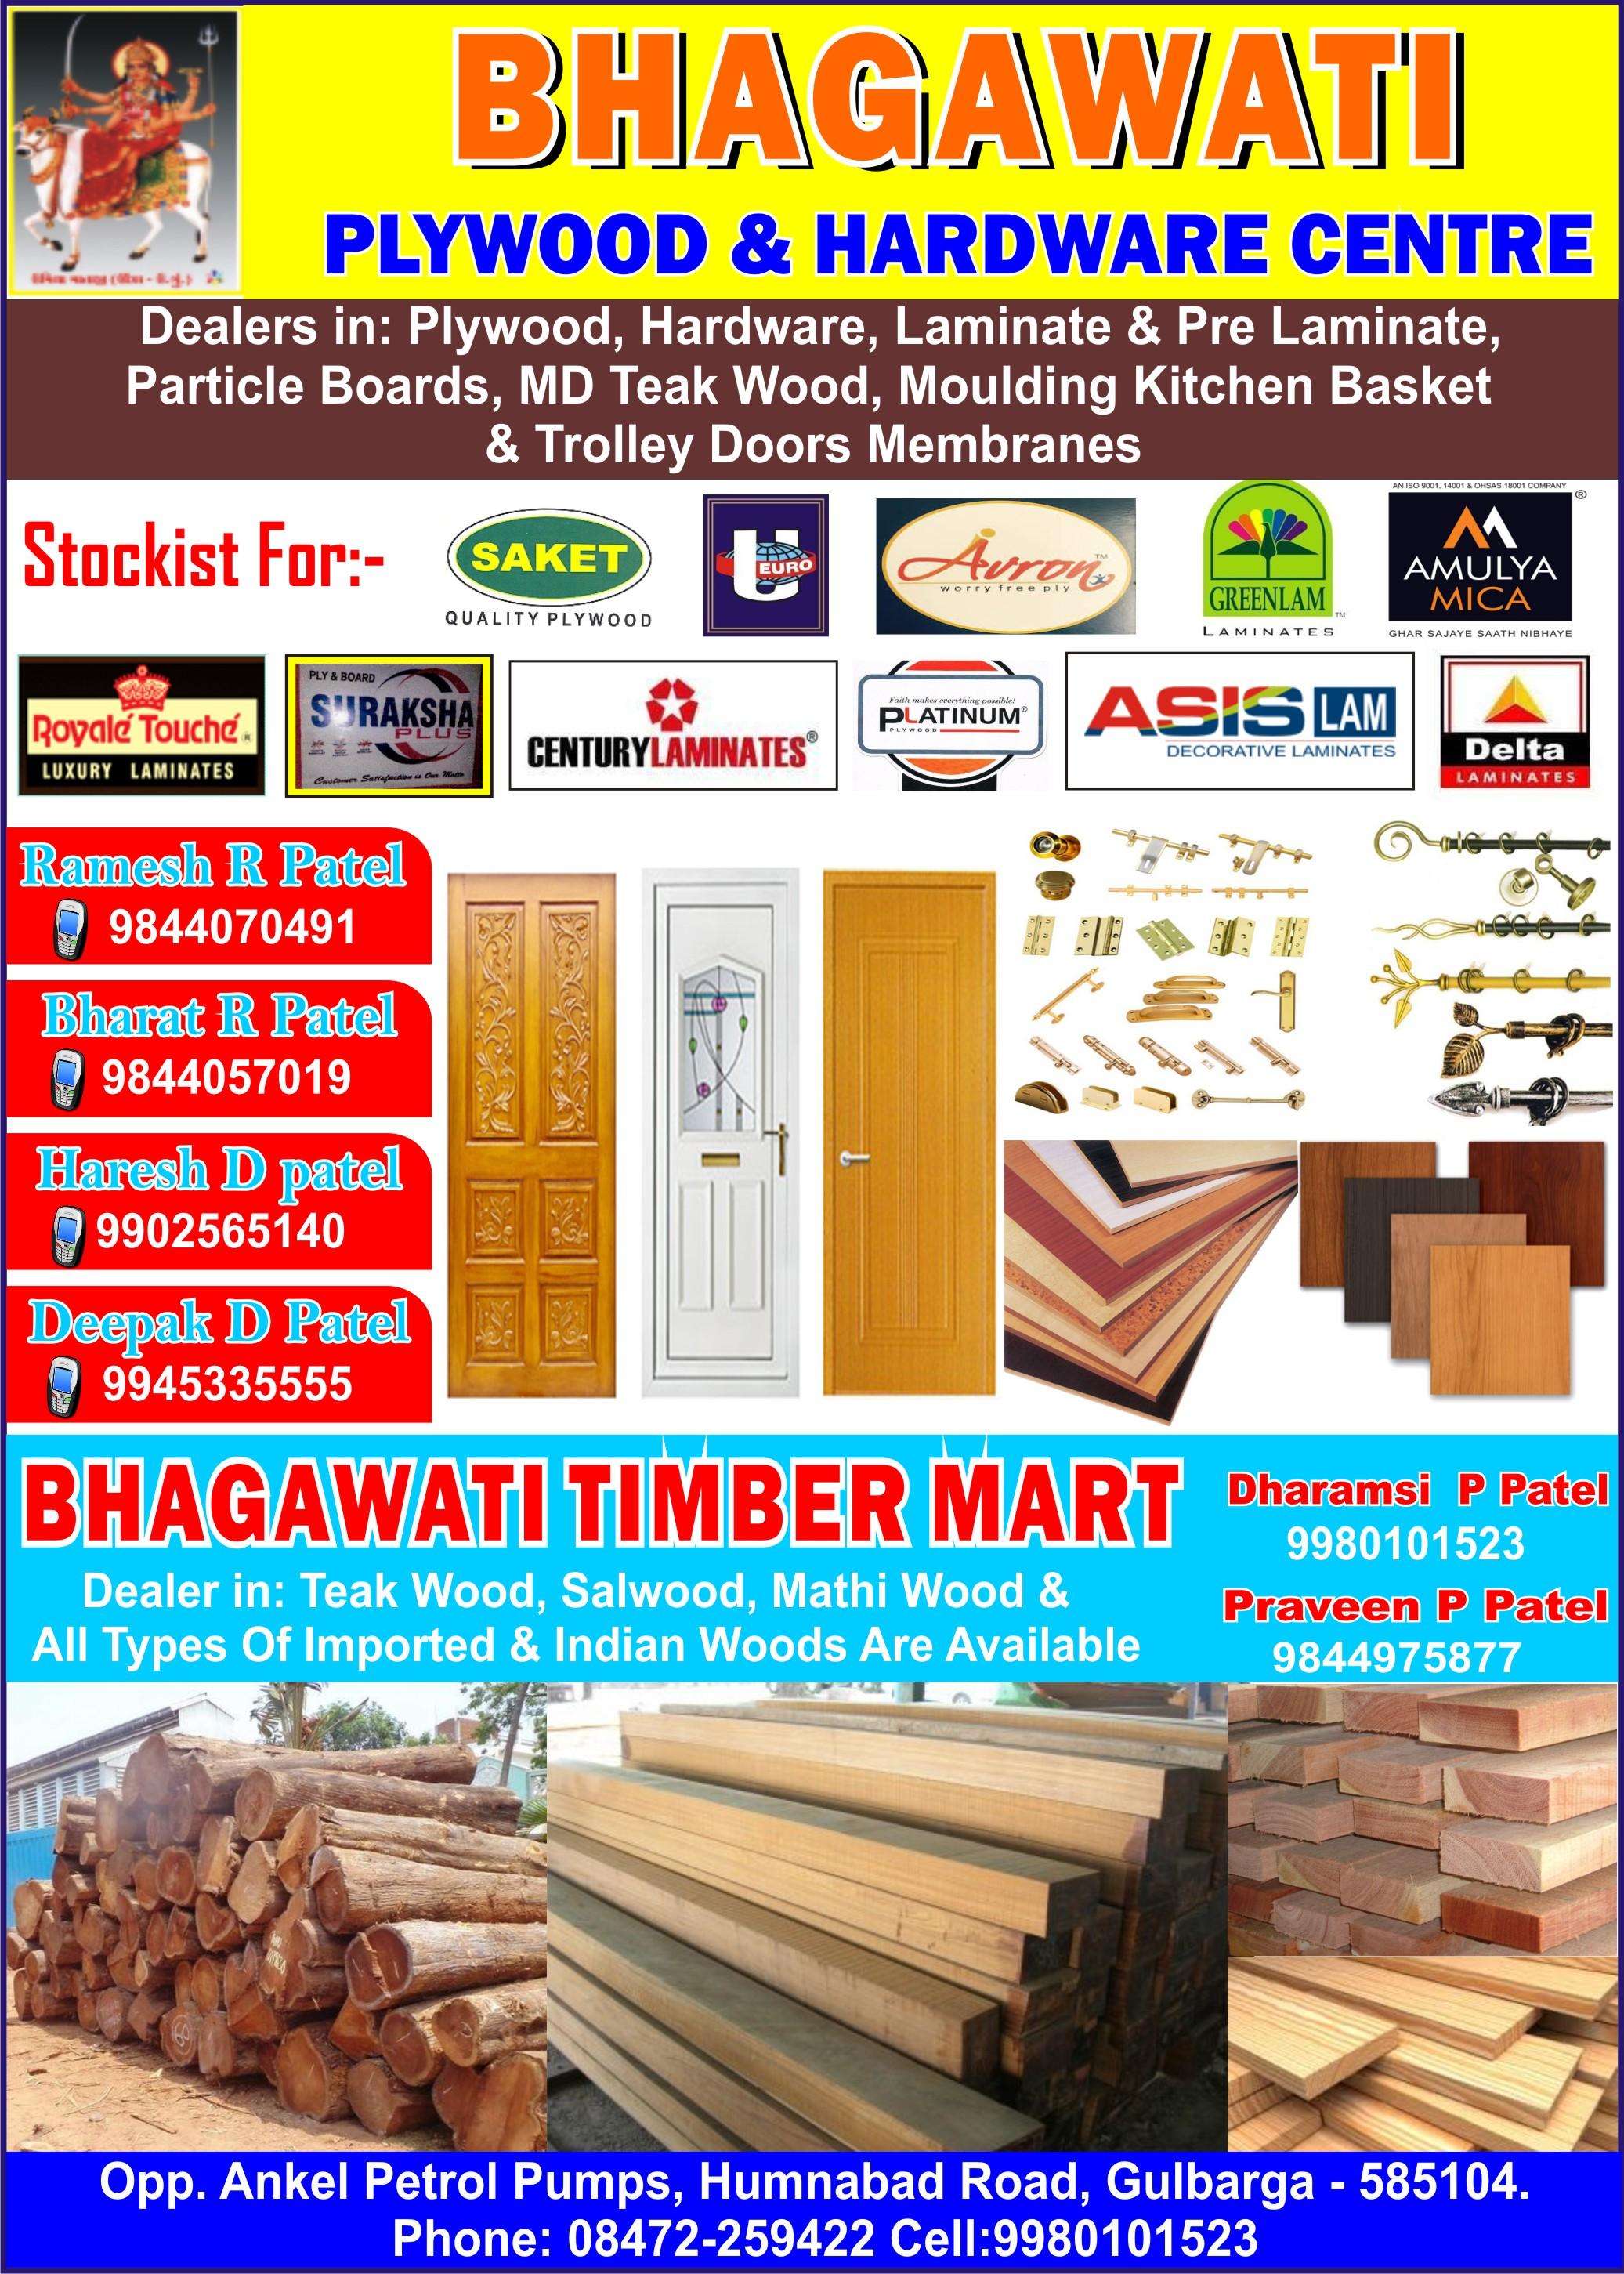 BHAGAWATI PLYWOOD & HARDWARE CENTRE